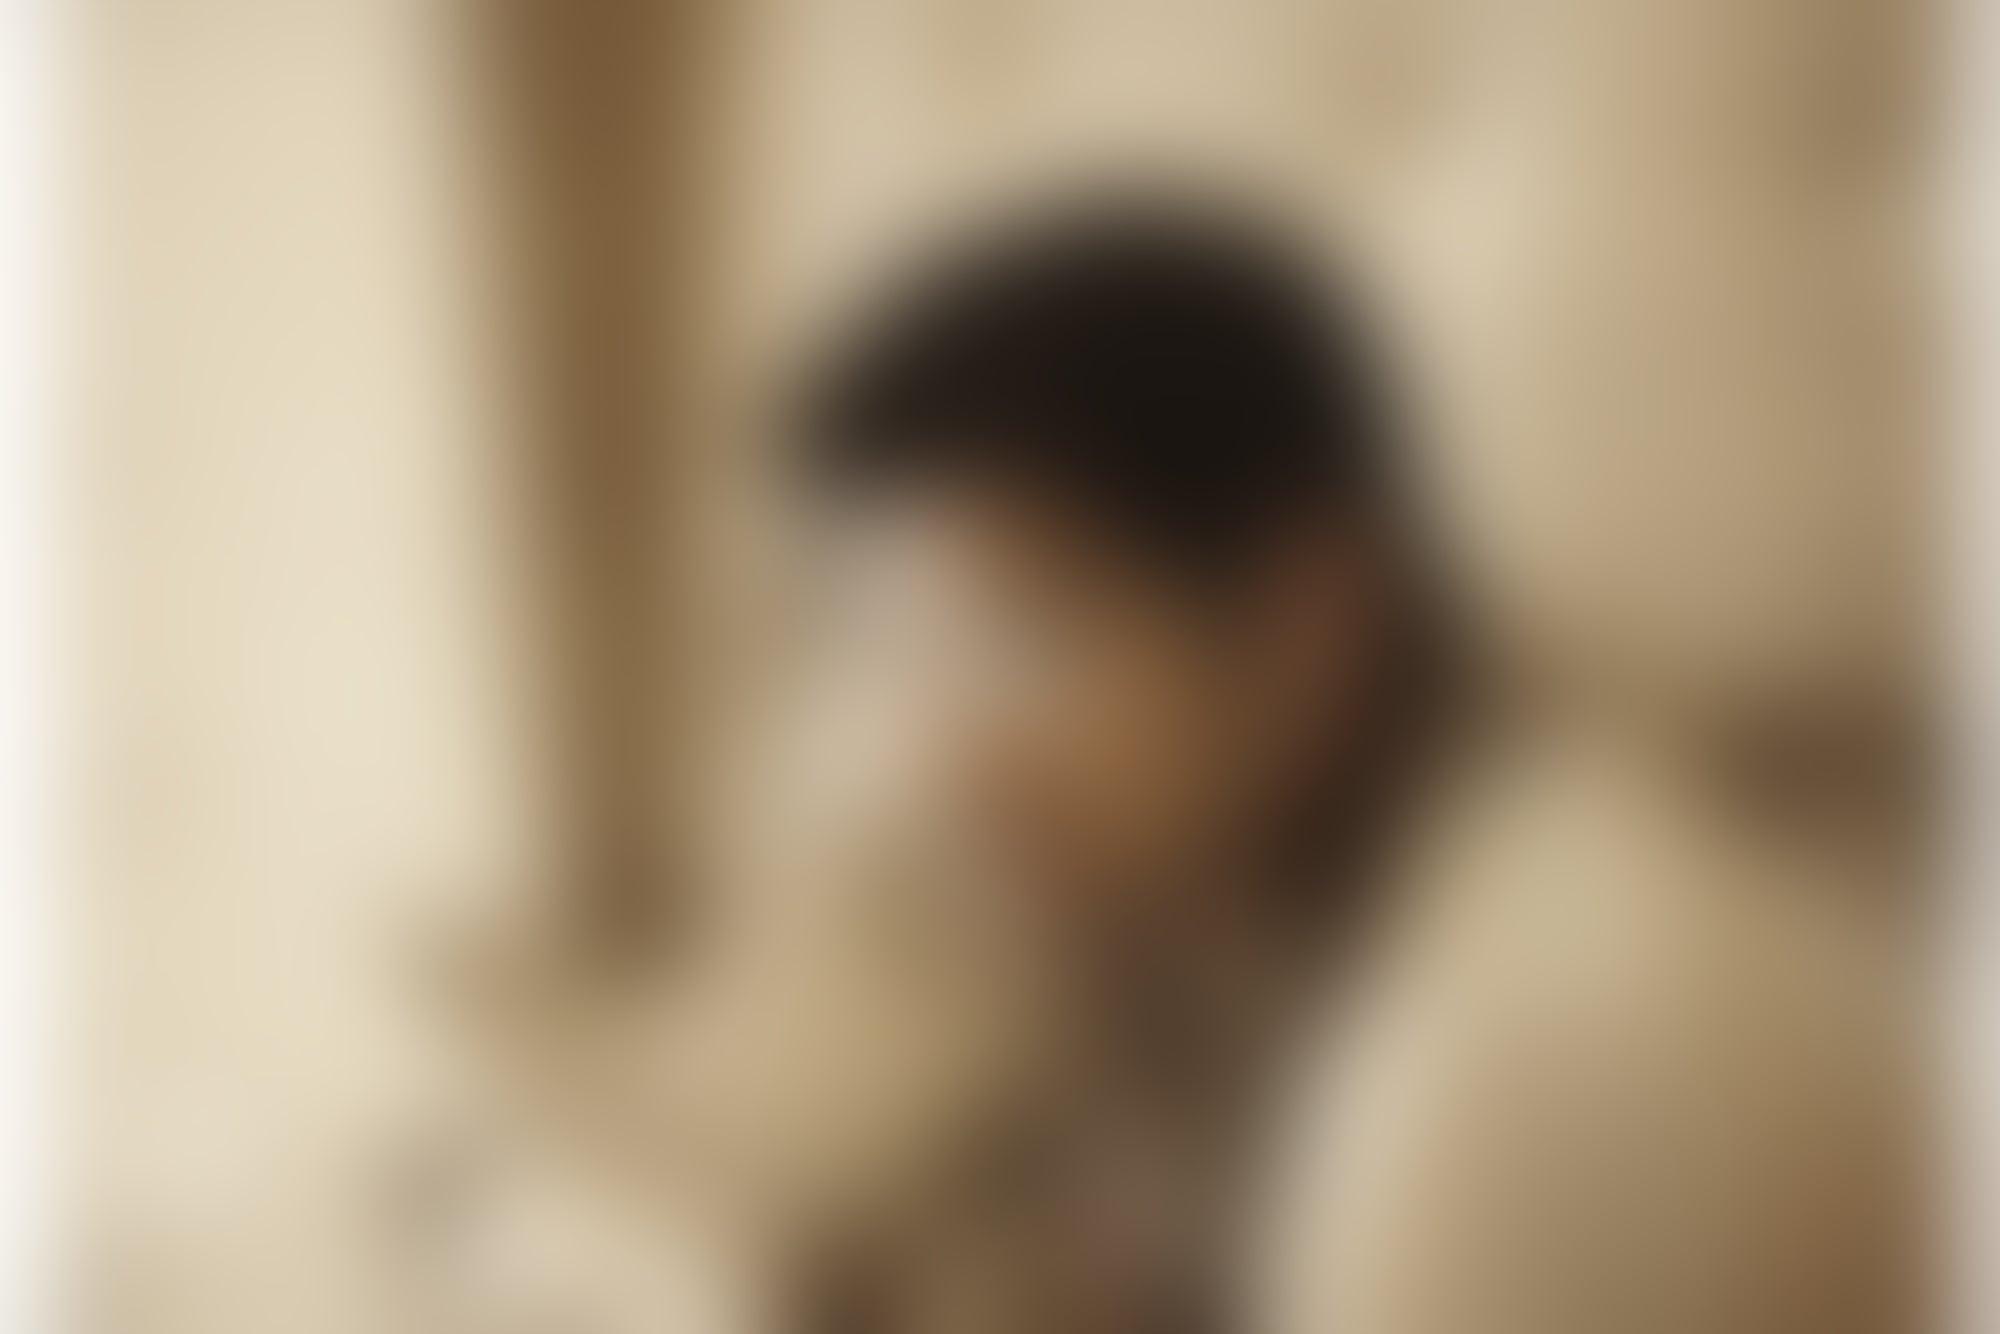 An Entrepreneur Turned Actor - The Journey of Baahubali Villain